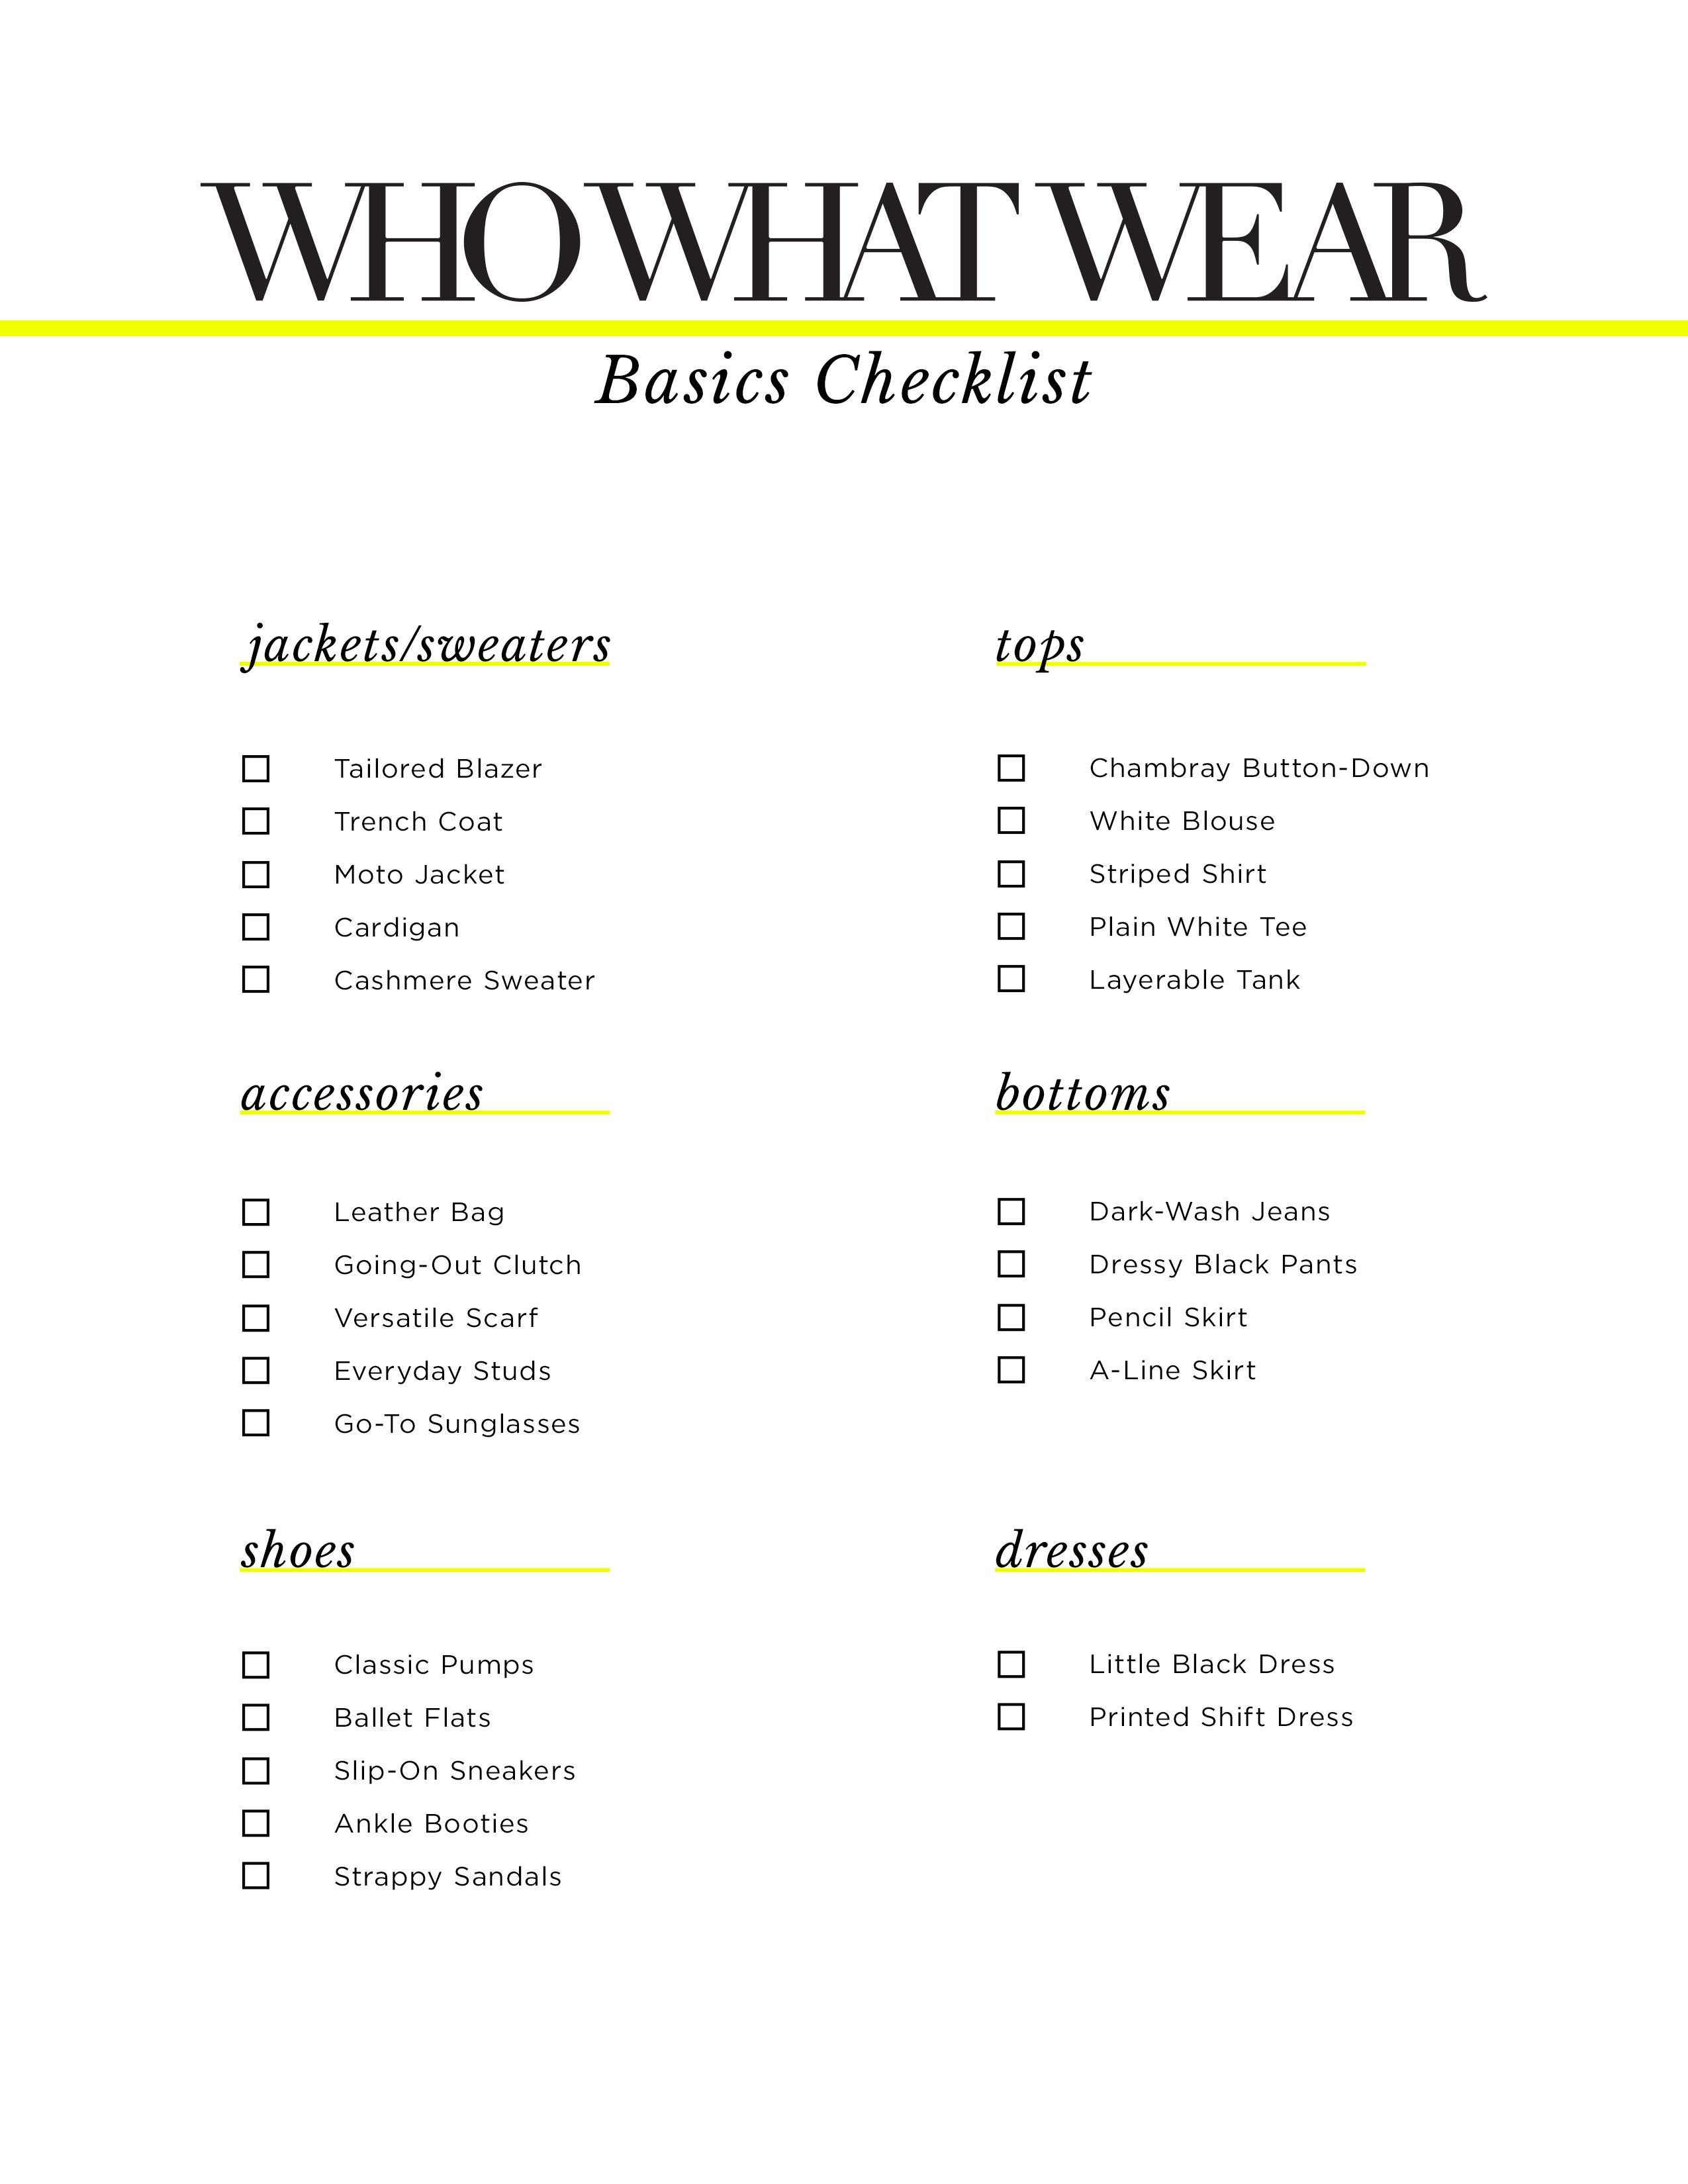 basics-shopping-checklist.jpg